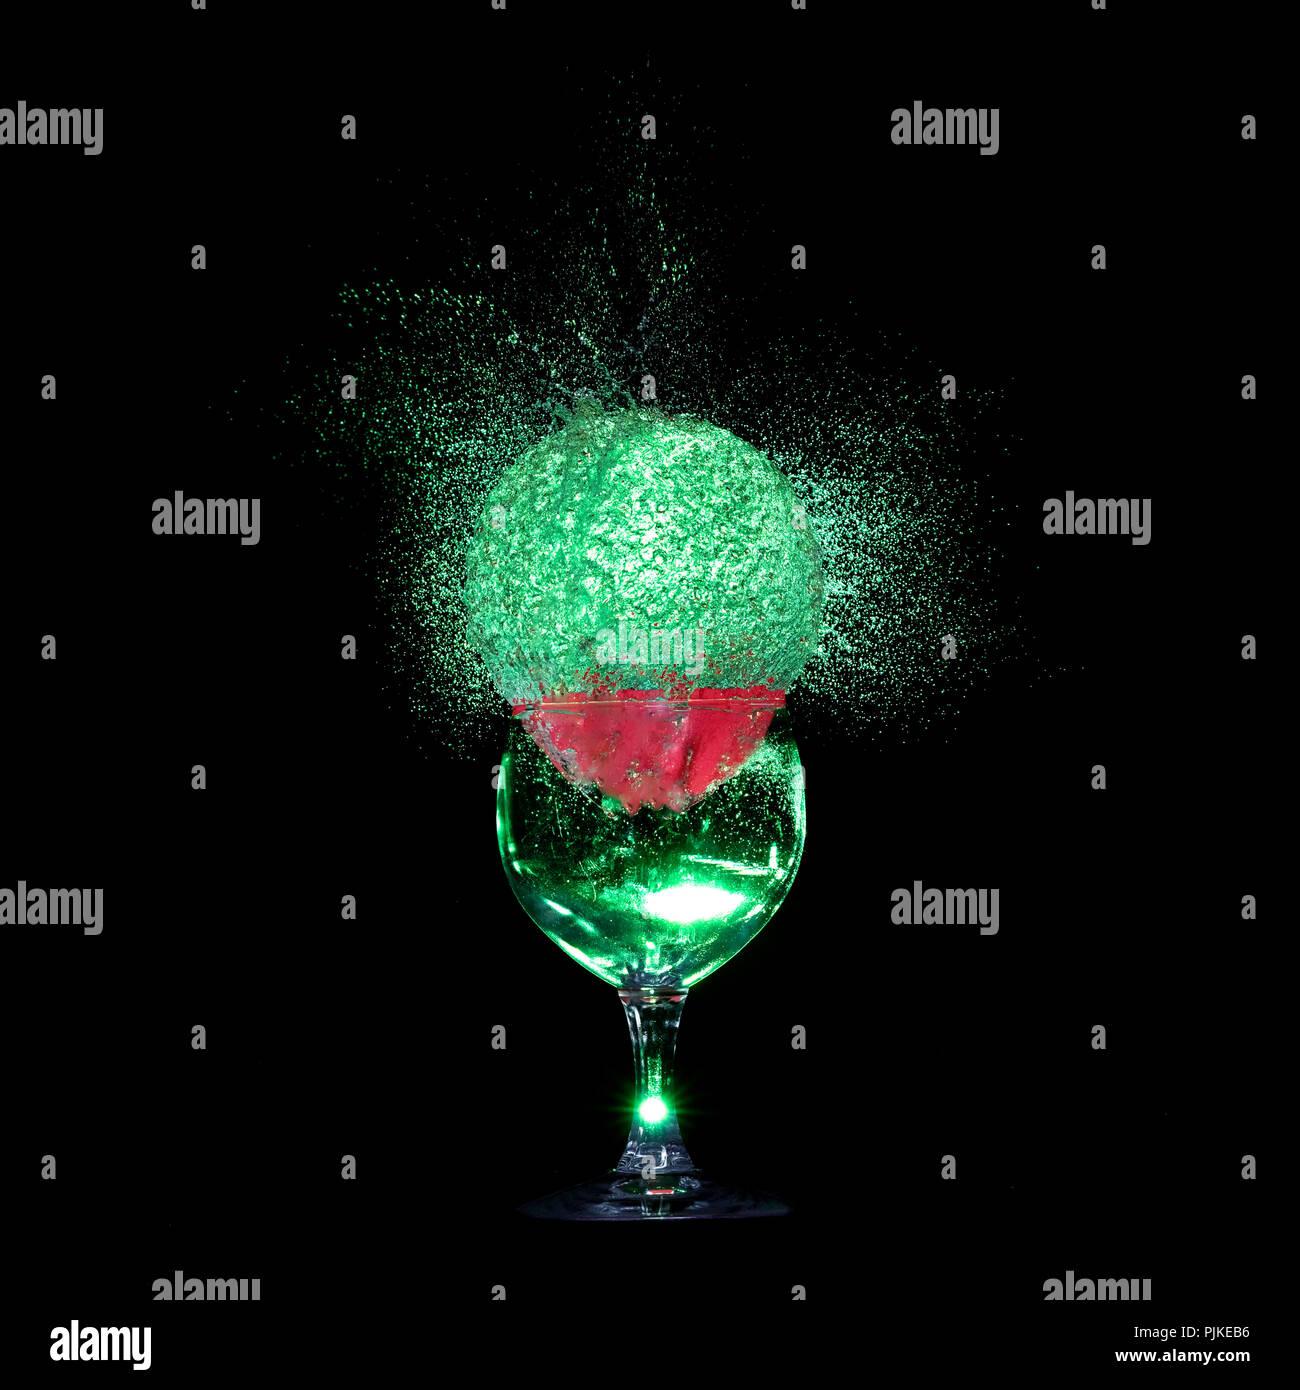 bursting water-filled balloon with wine glass, studio shot - Stock Image